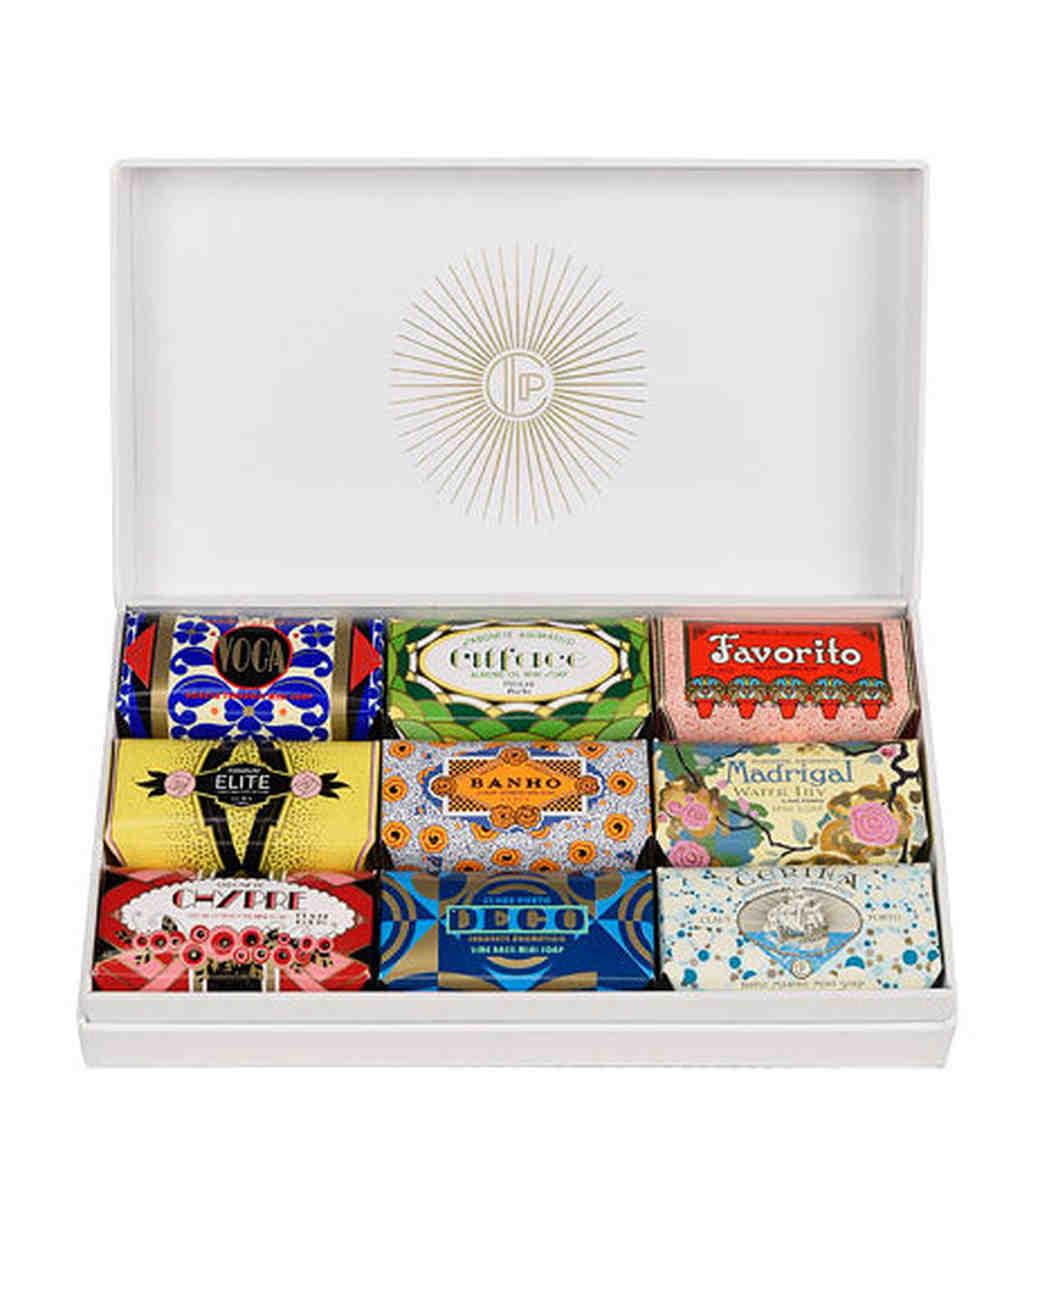 mom gift guide neiman marcus claus porto deco soaps